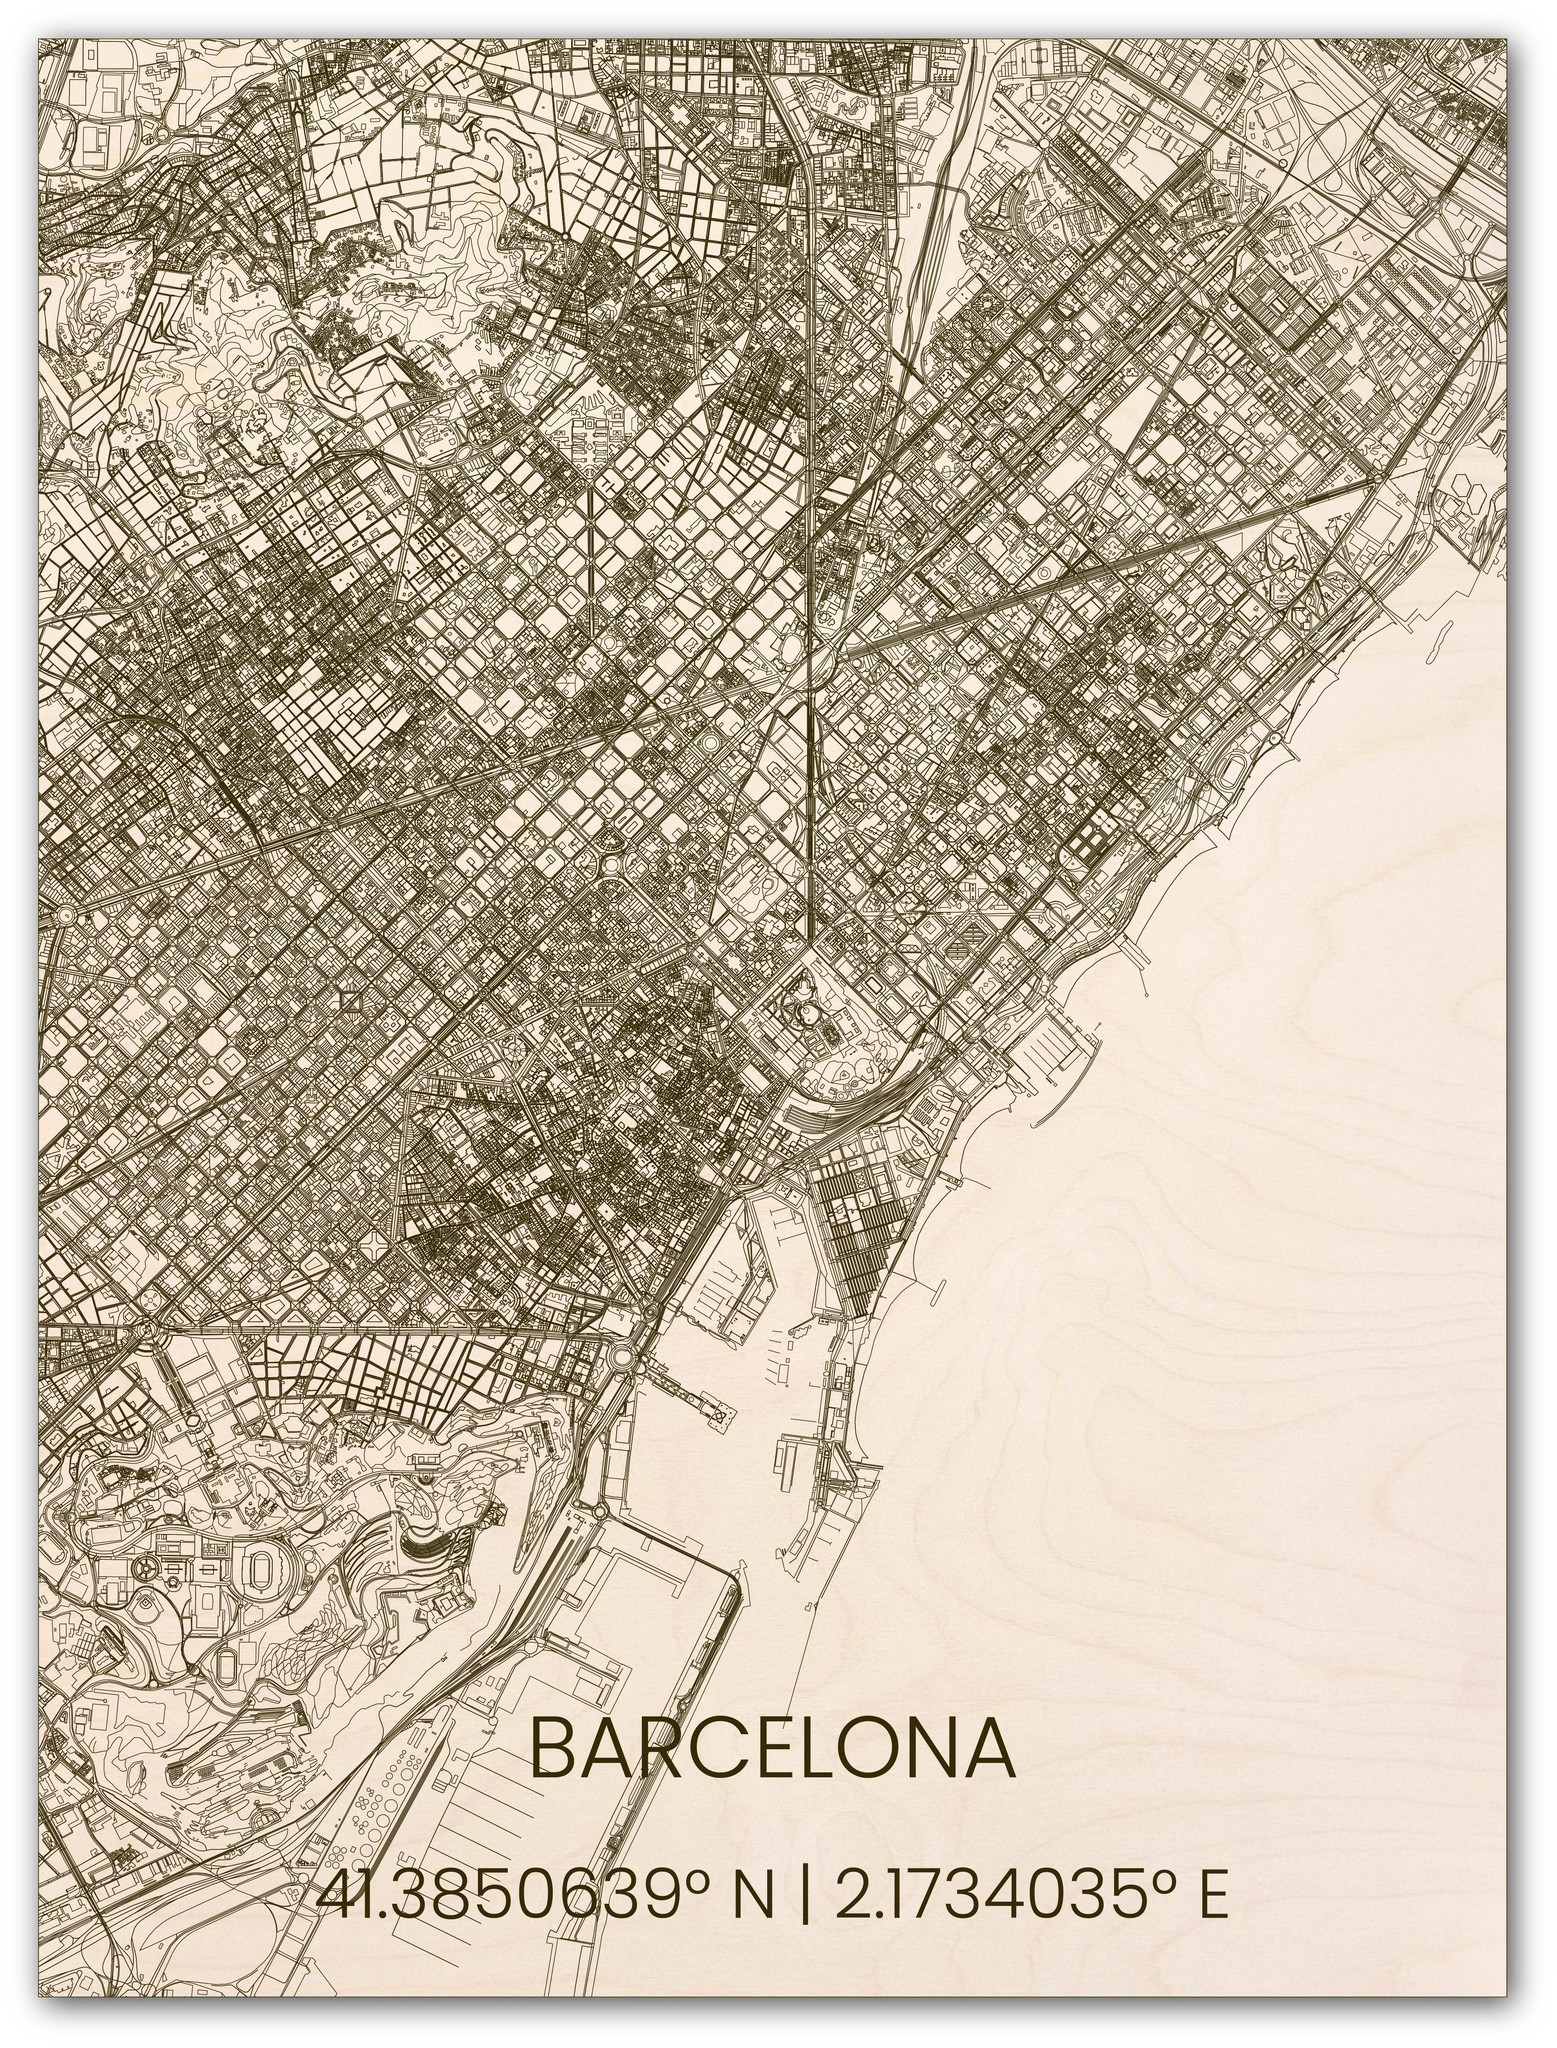 Houten stadsplattegrond Barcelona-1